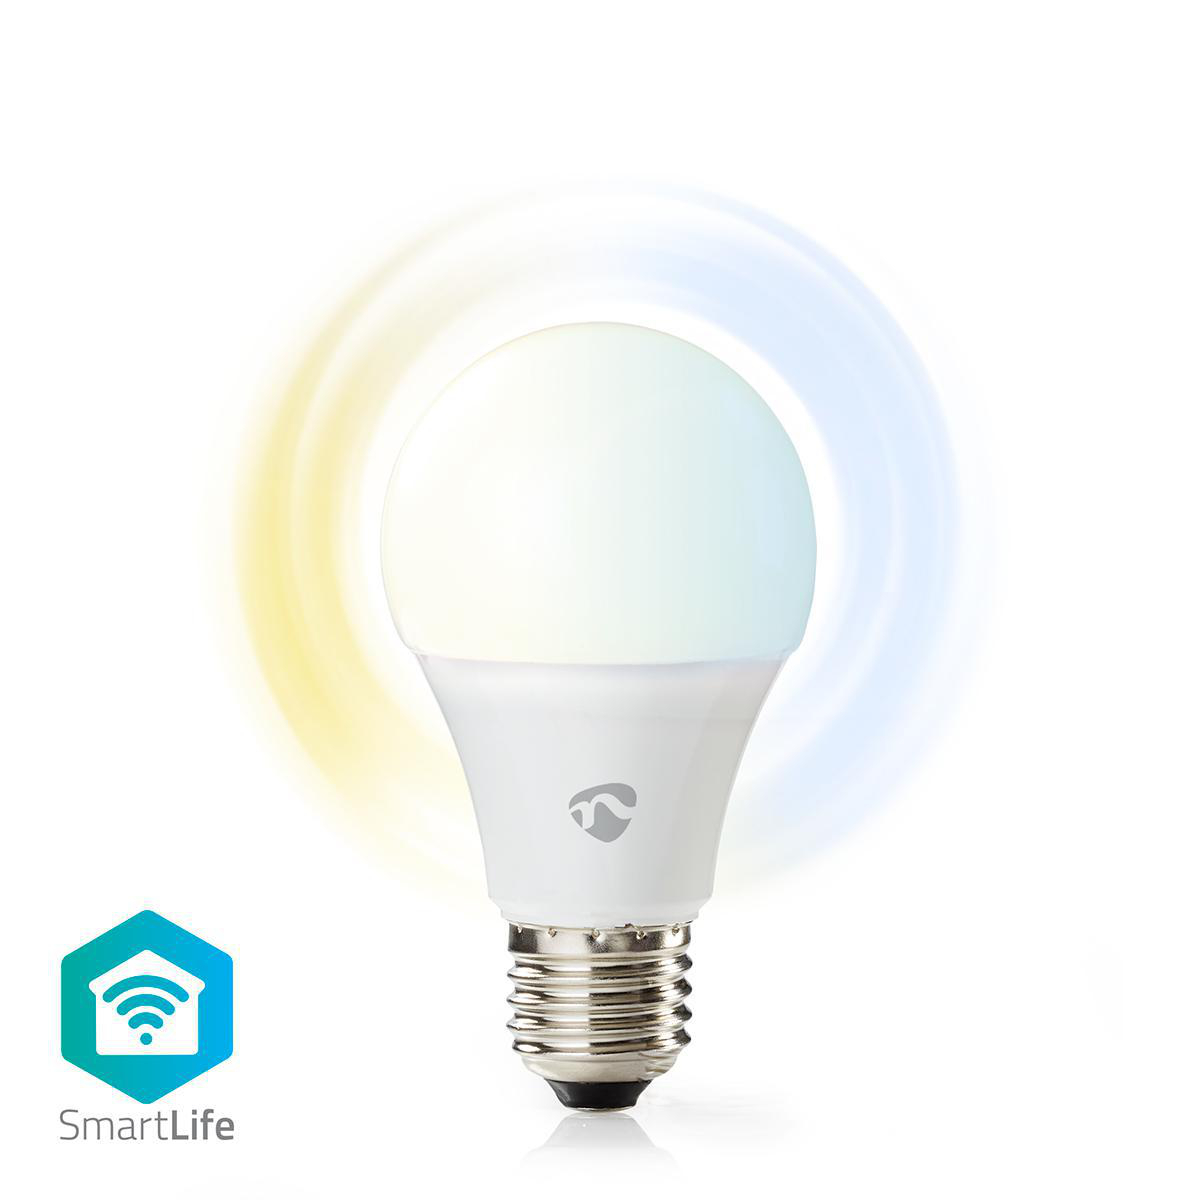 Slimme Wi-Fi Led Lamp 9 Watt CCT - Kleurwissel - verschillende lichtkleuren